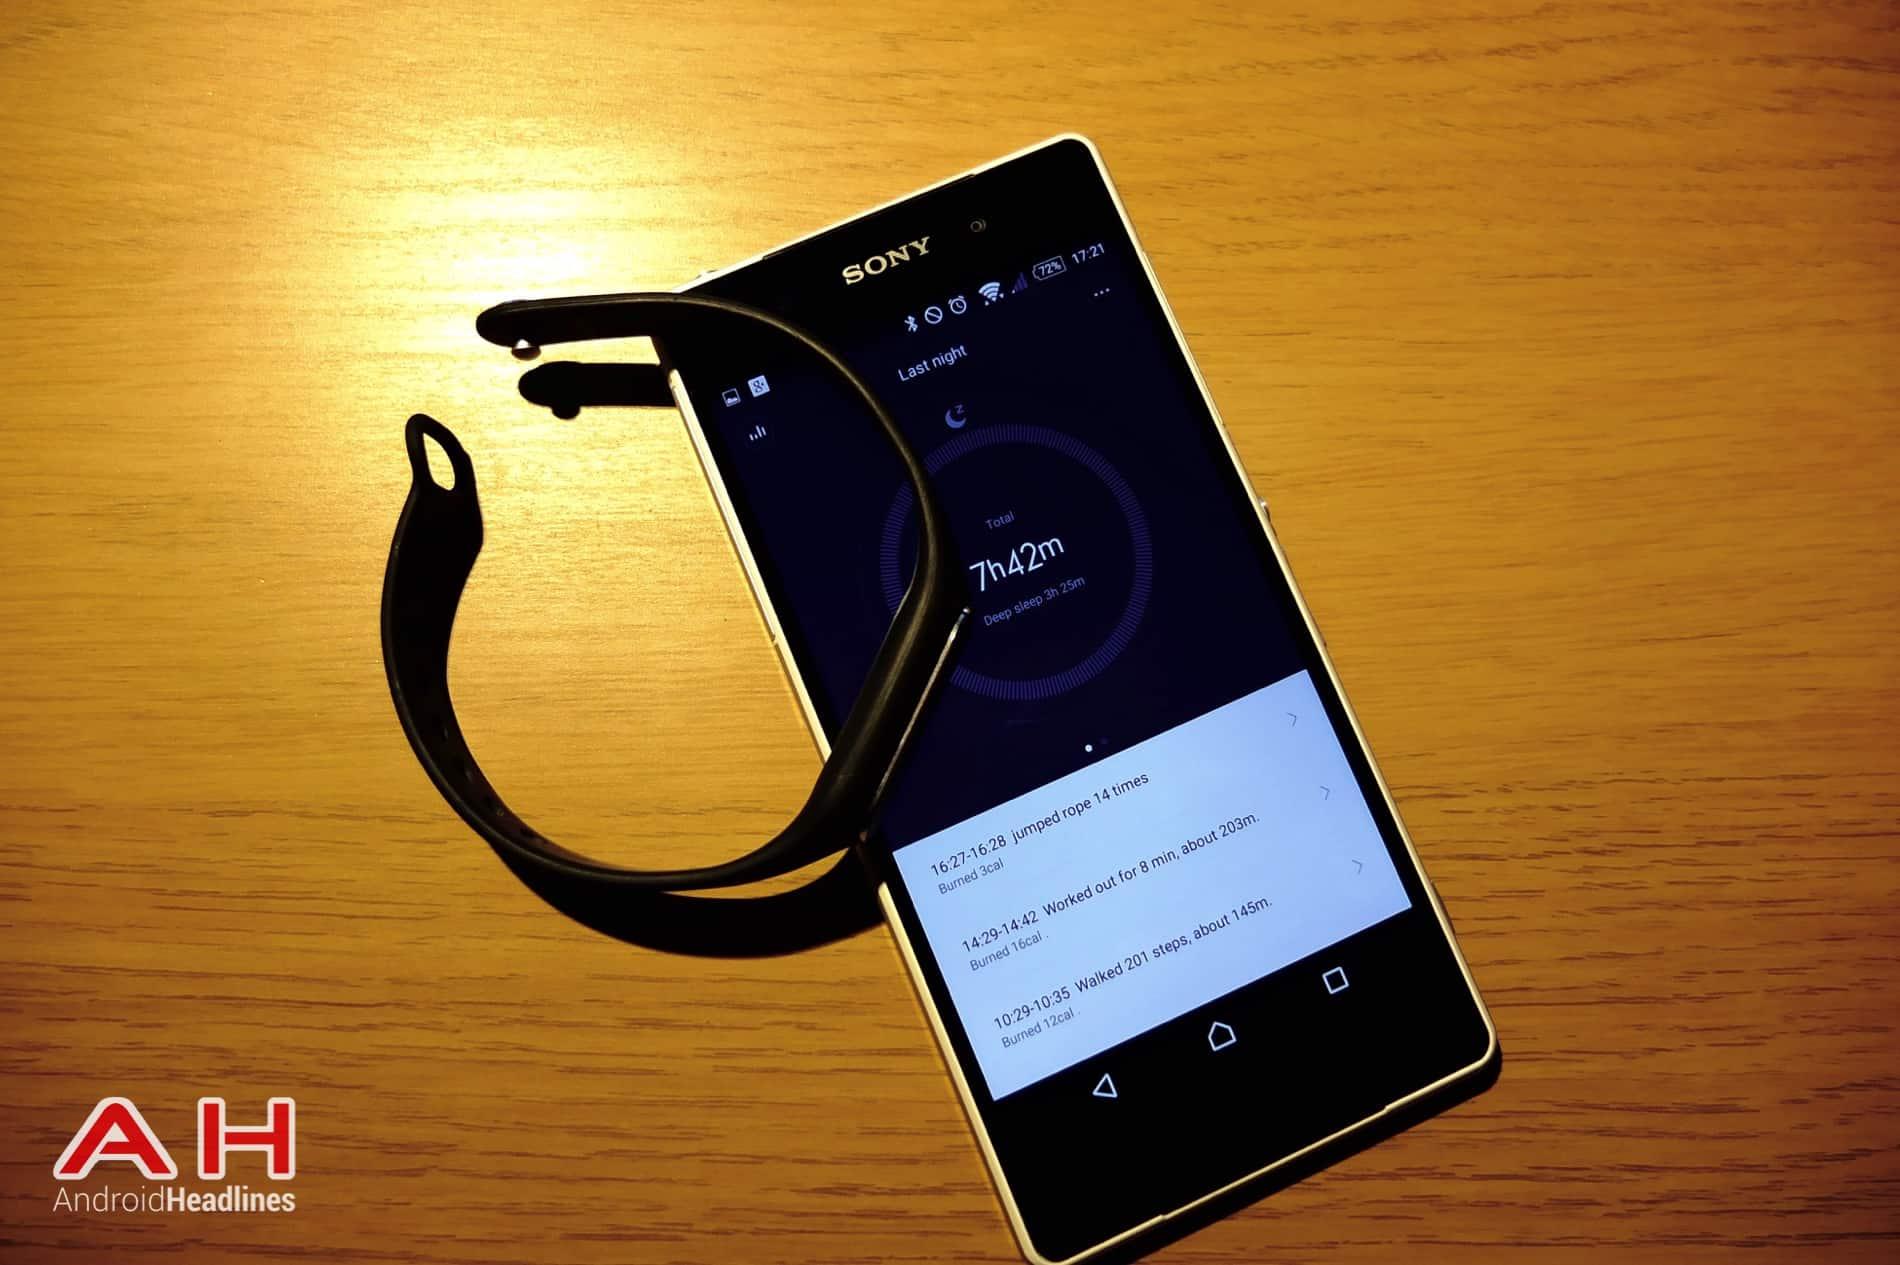 Xiaomi MI Band AH 11